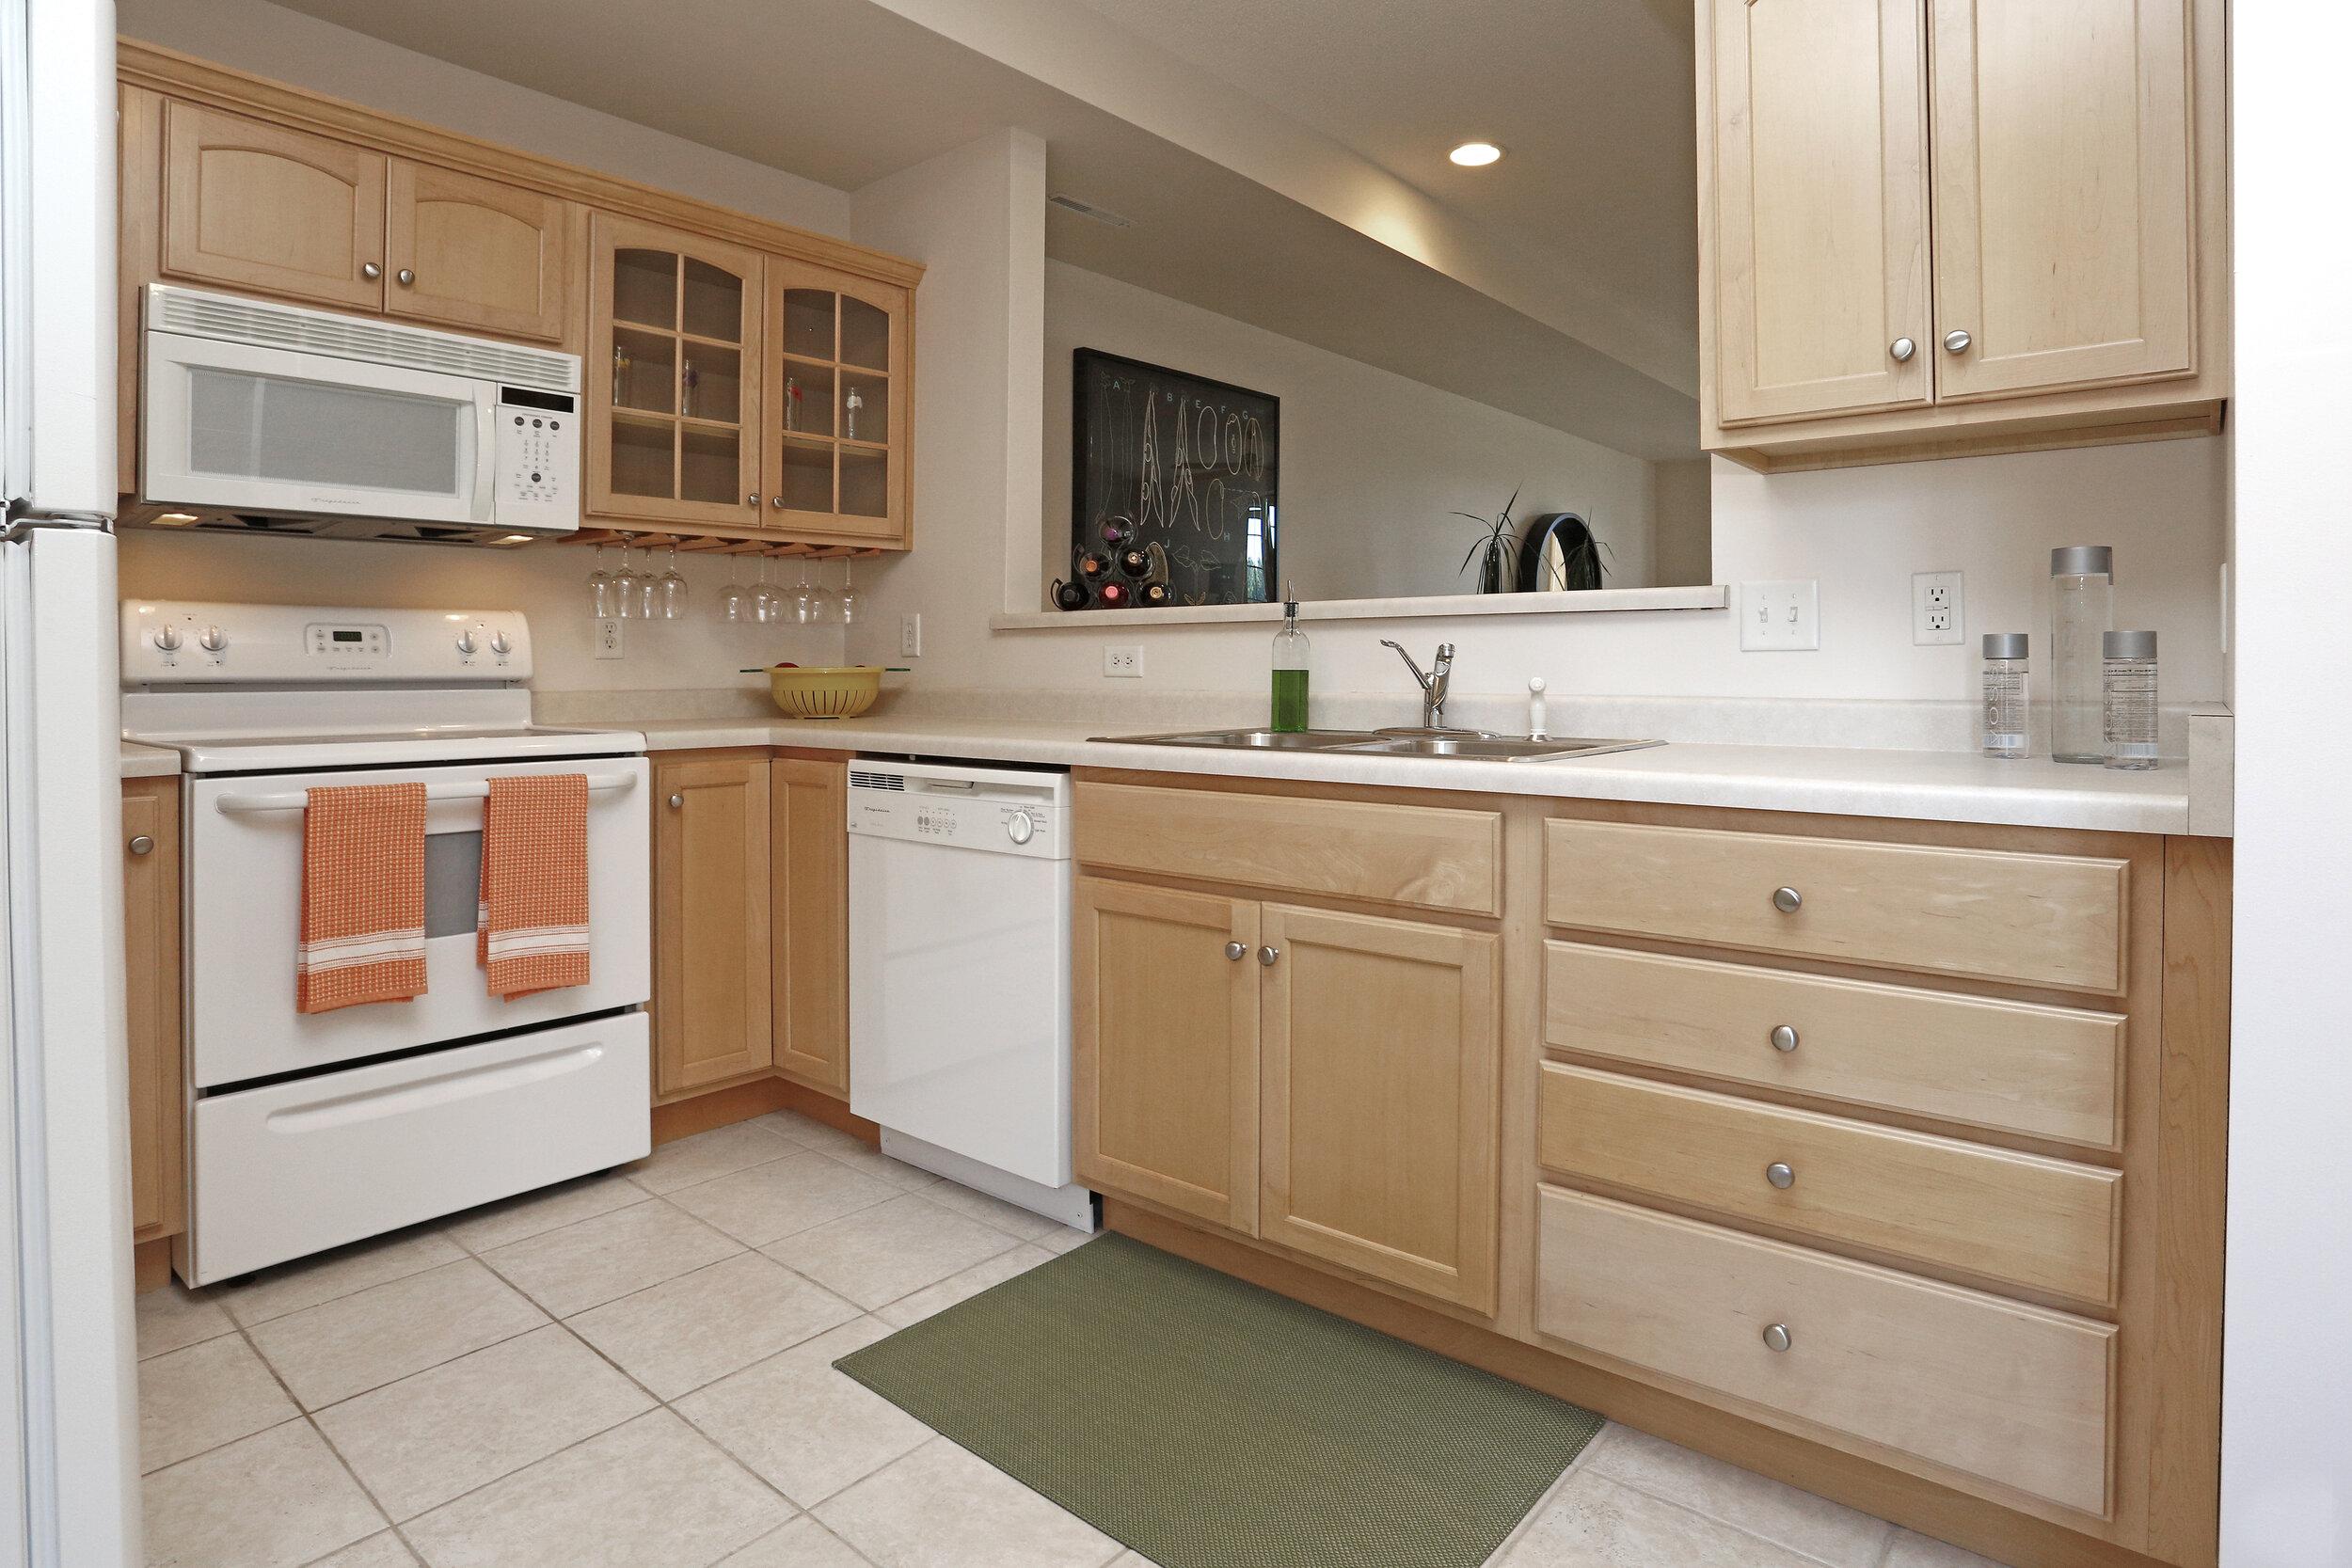 Open Kitchens Overlook the Living Area